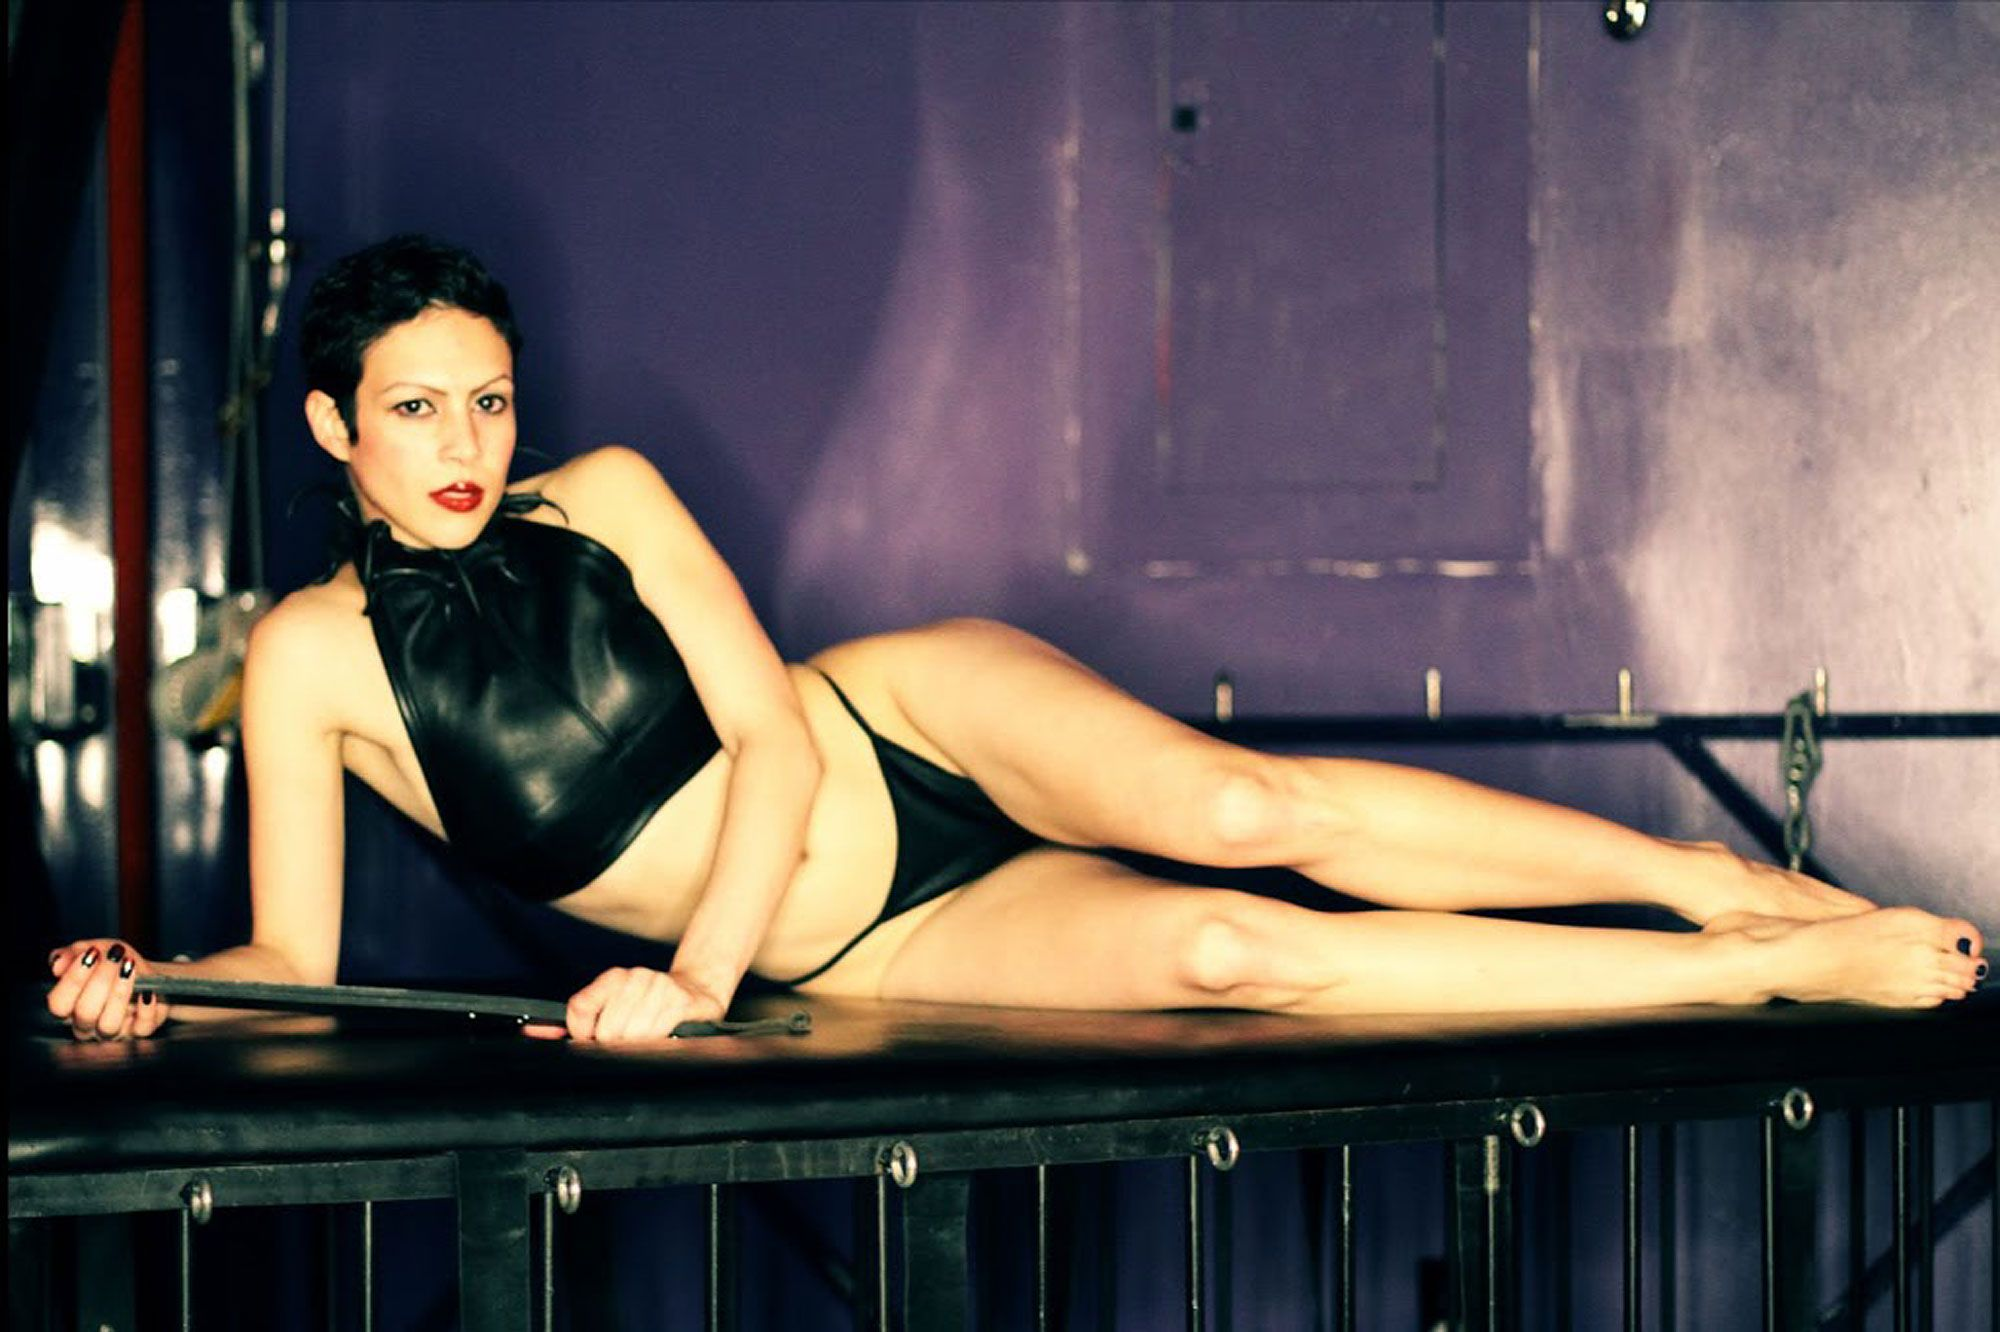 Marica Pellegrinelli Nude Photos and Videos,Rachel Escudero Nude Photos and Videos Erotic images Margot Robbie Nude and -,Tina Kunakey See Through